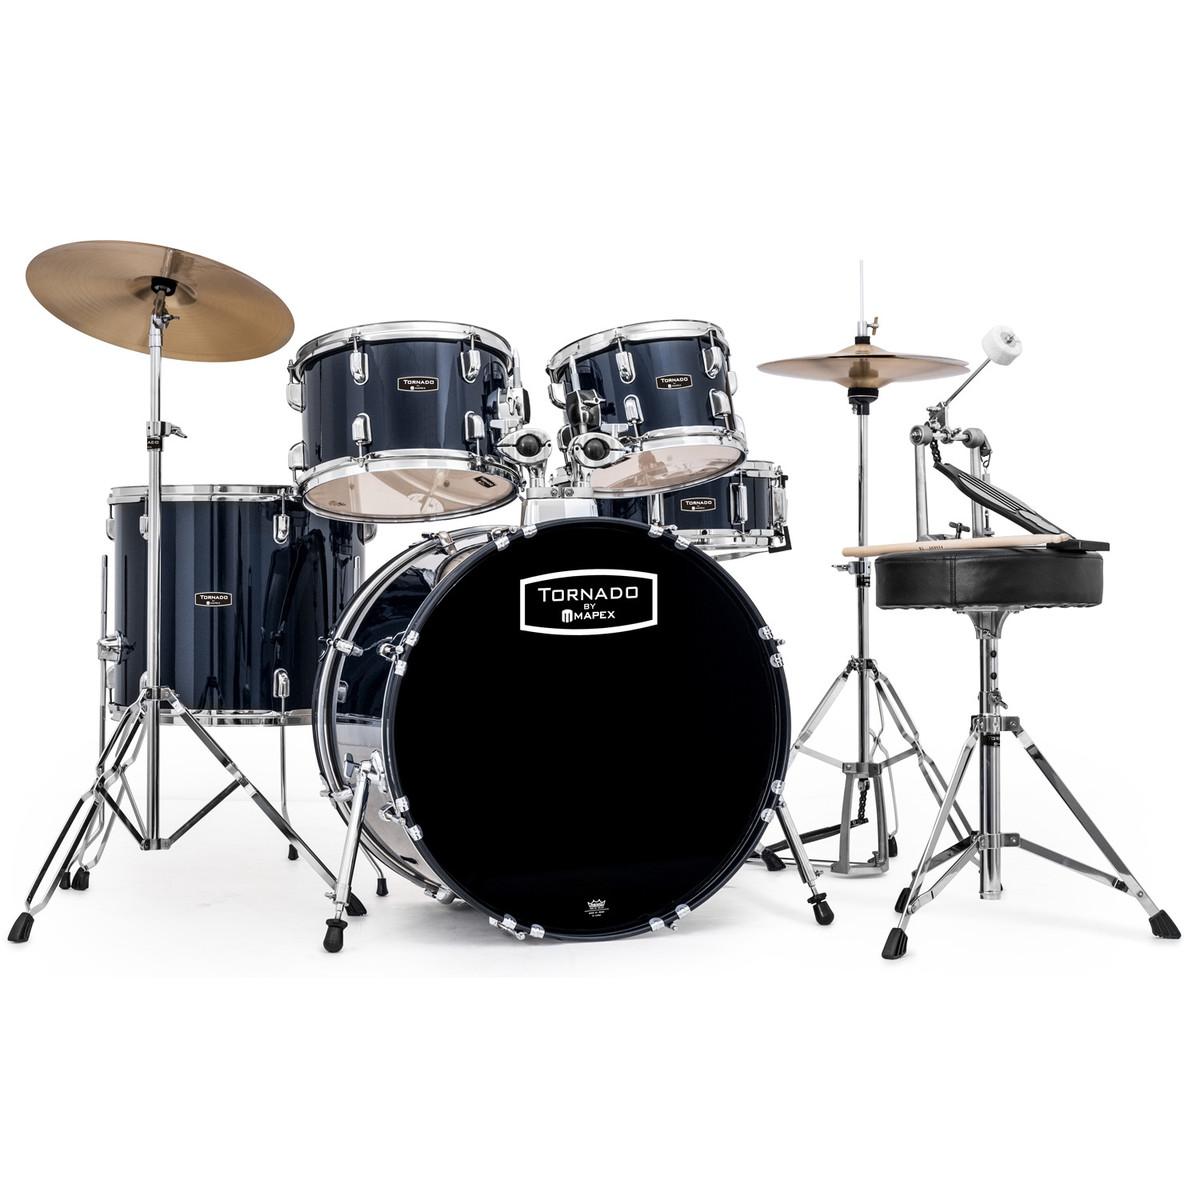 Mapex Tornado Iii 22 Rock Fusion Drum Kit Blue Ex